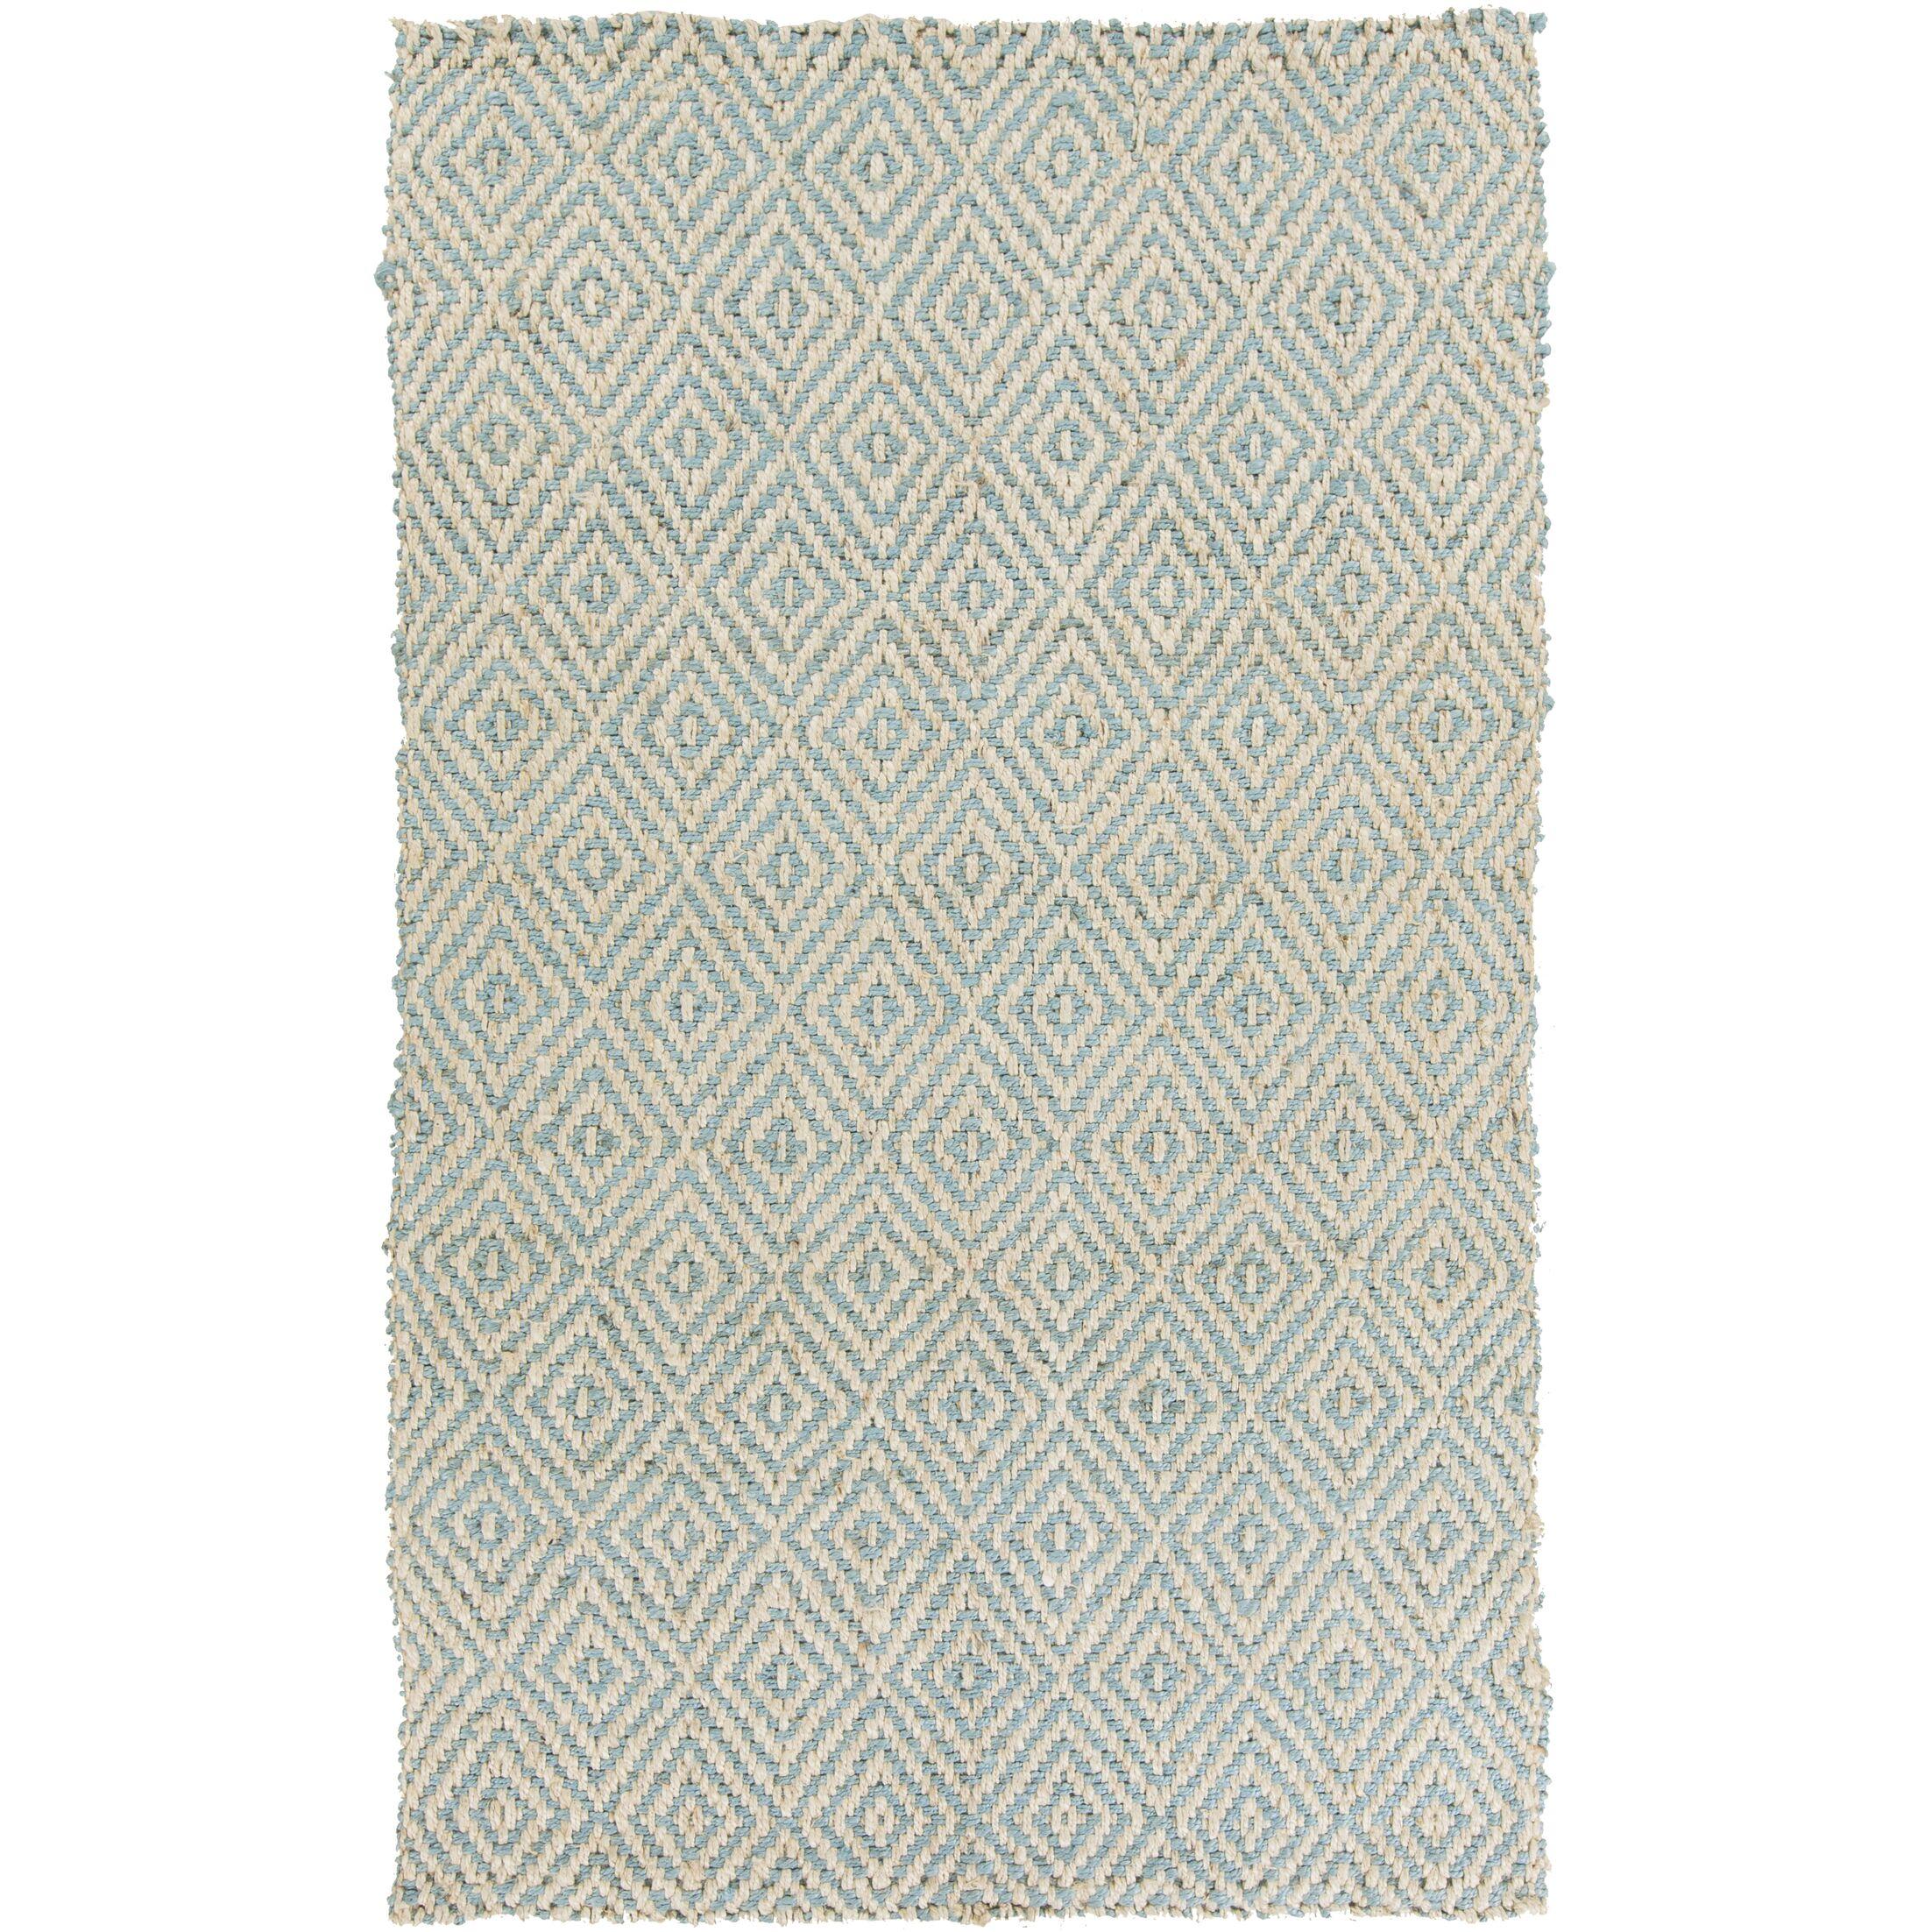 Annalee Hand-Woven Cream/Aqua Area Rug Rug Size: Rectangle 5' x 8'